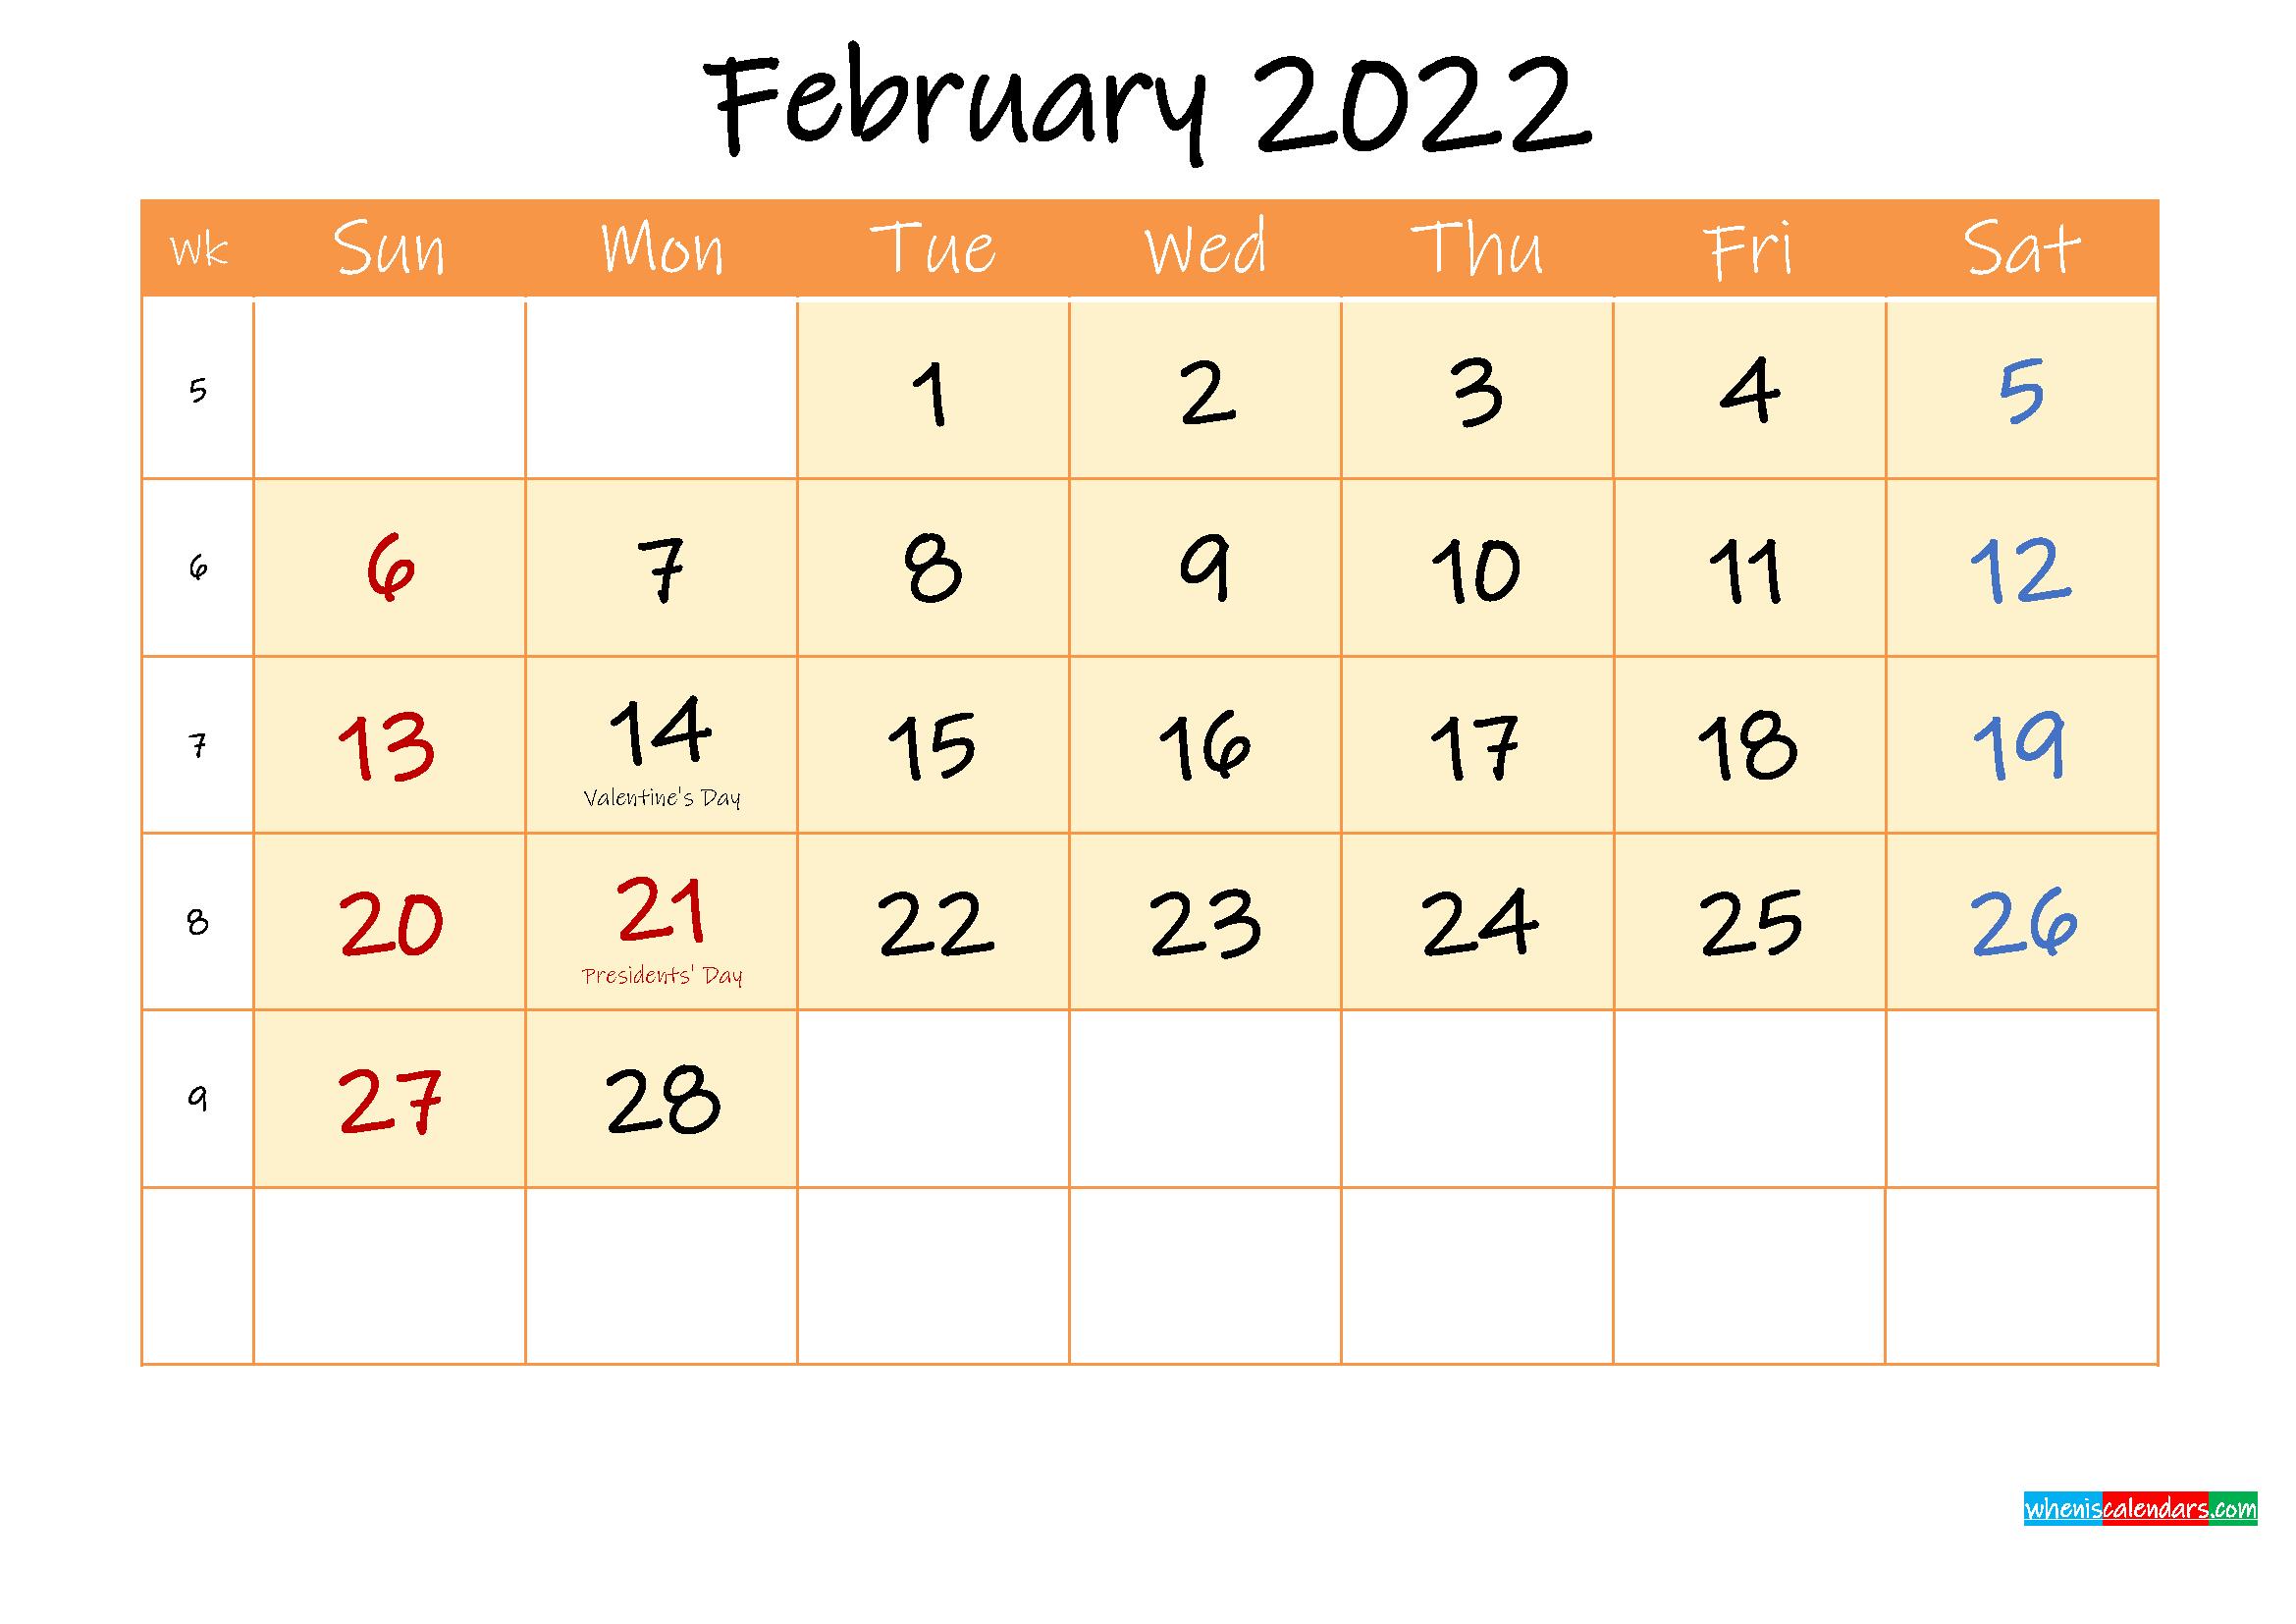 February 2022 Free Printable Calendar - Template Ink22M158 Within Printable Calendar February 2022